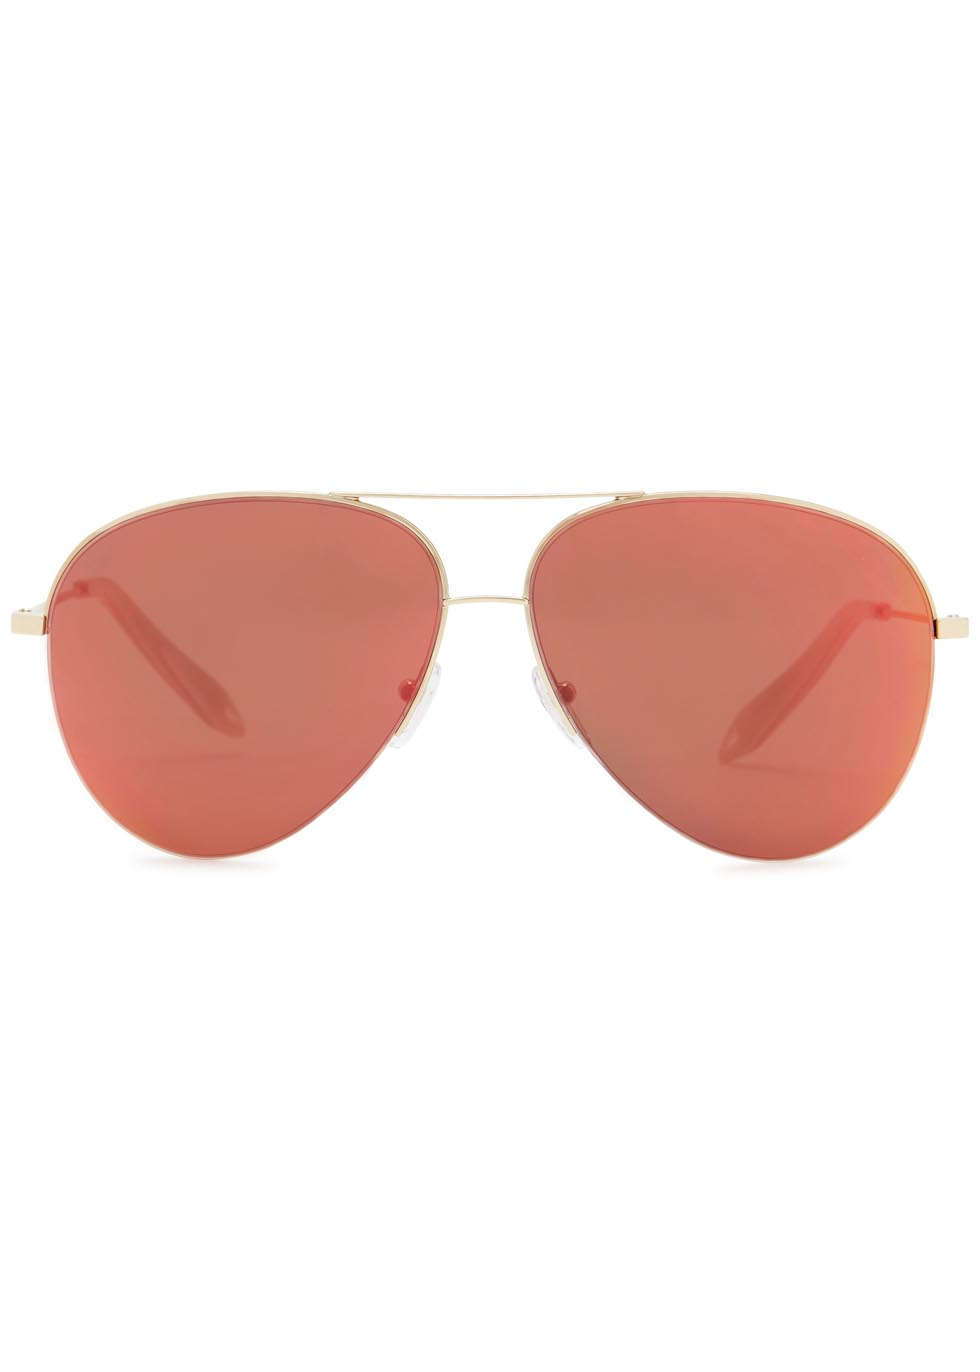 Classic Victoria red mirrored sunglasses - Victoria Beckham